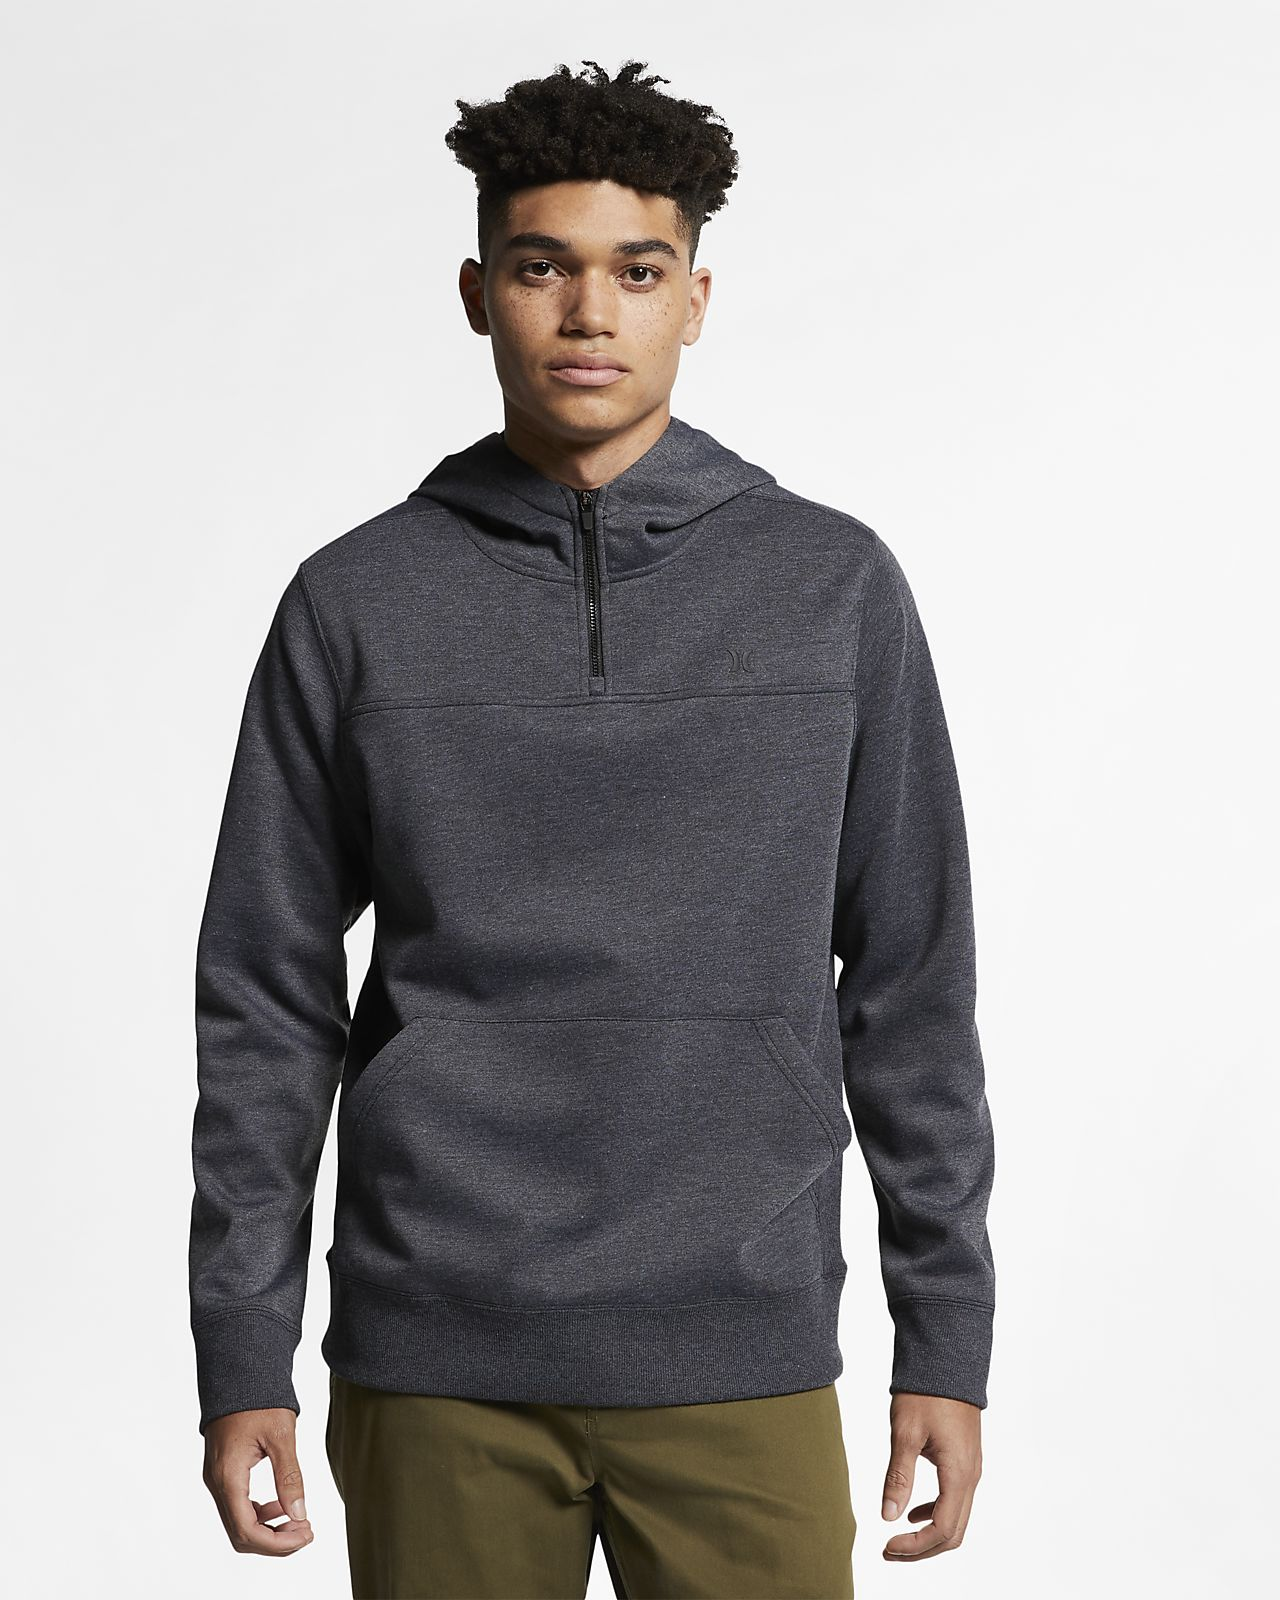 Felpa in fleece con cappuccio e zip a 1/4 Hurley Therma Protect Plus - Uomo